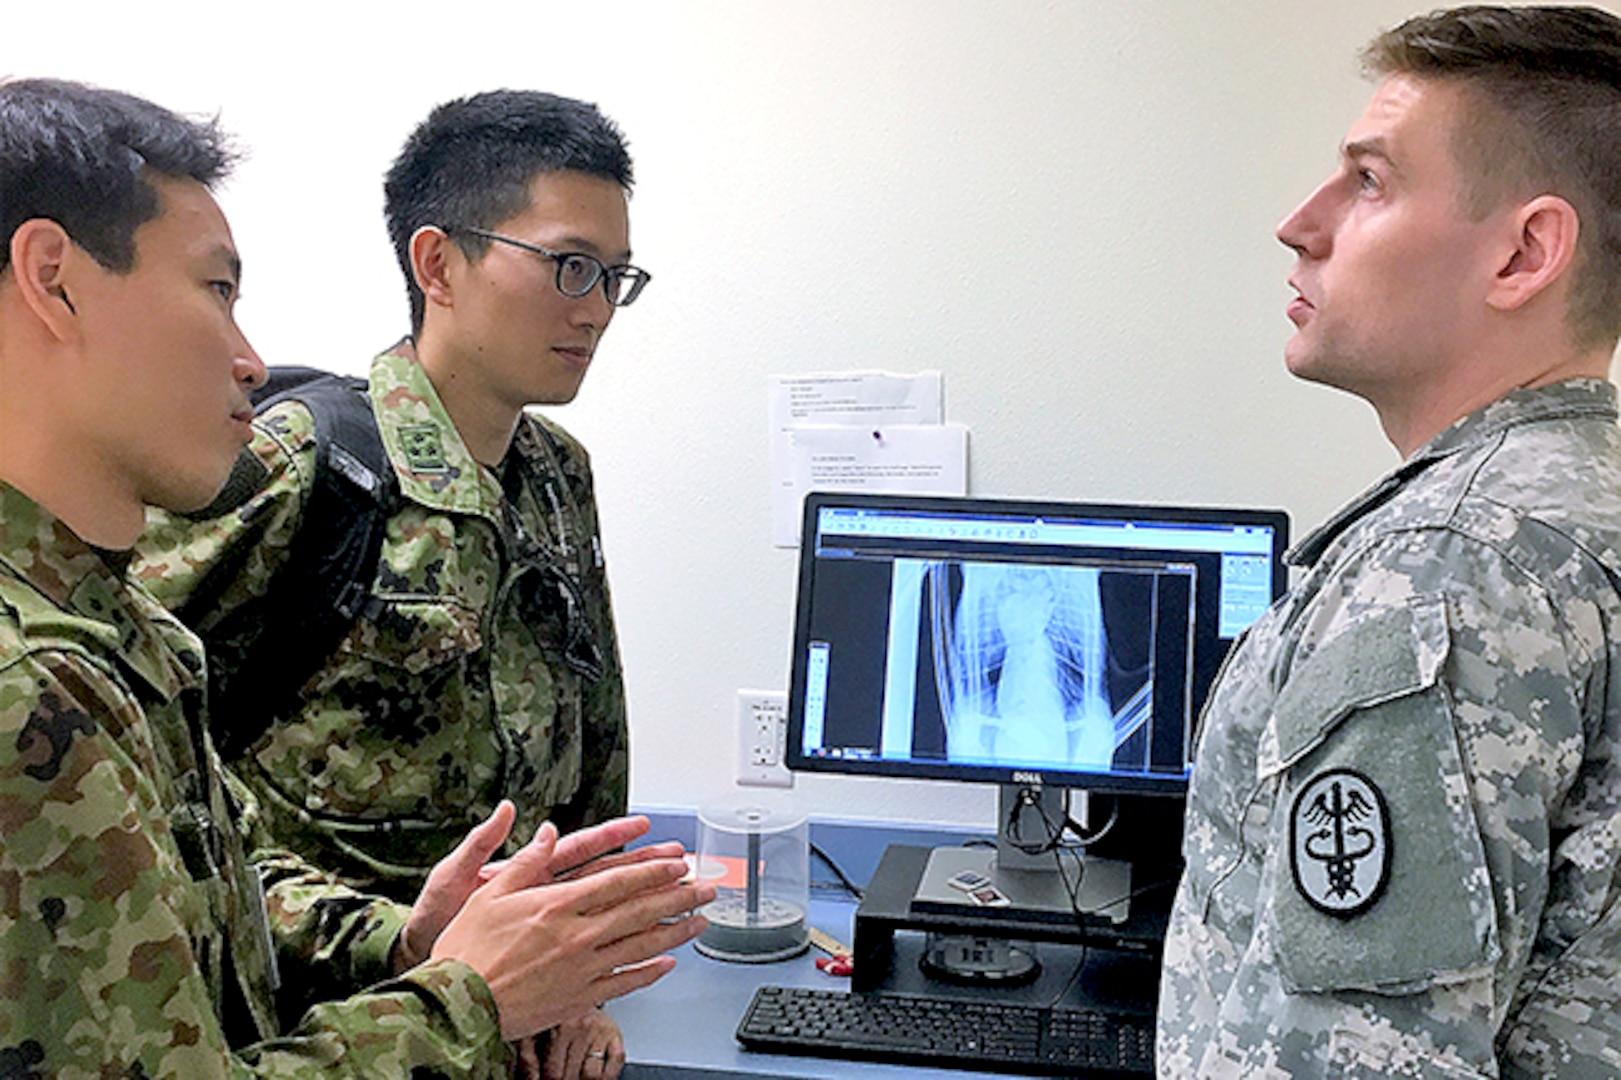 Pacific allies observe U.S. military medicine